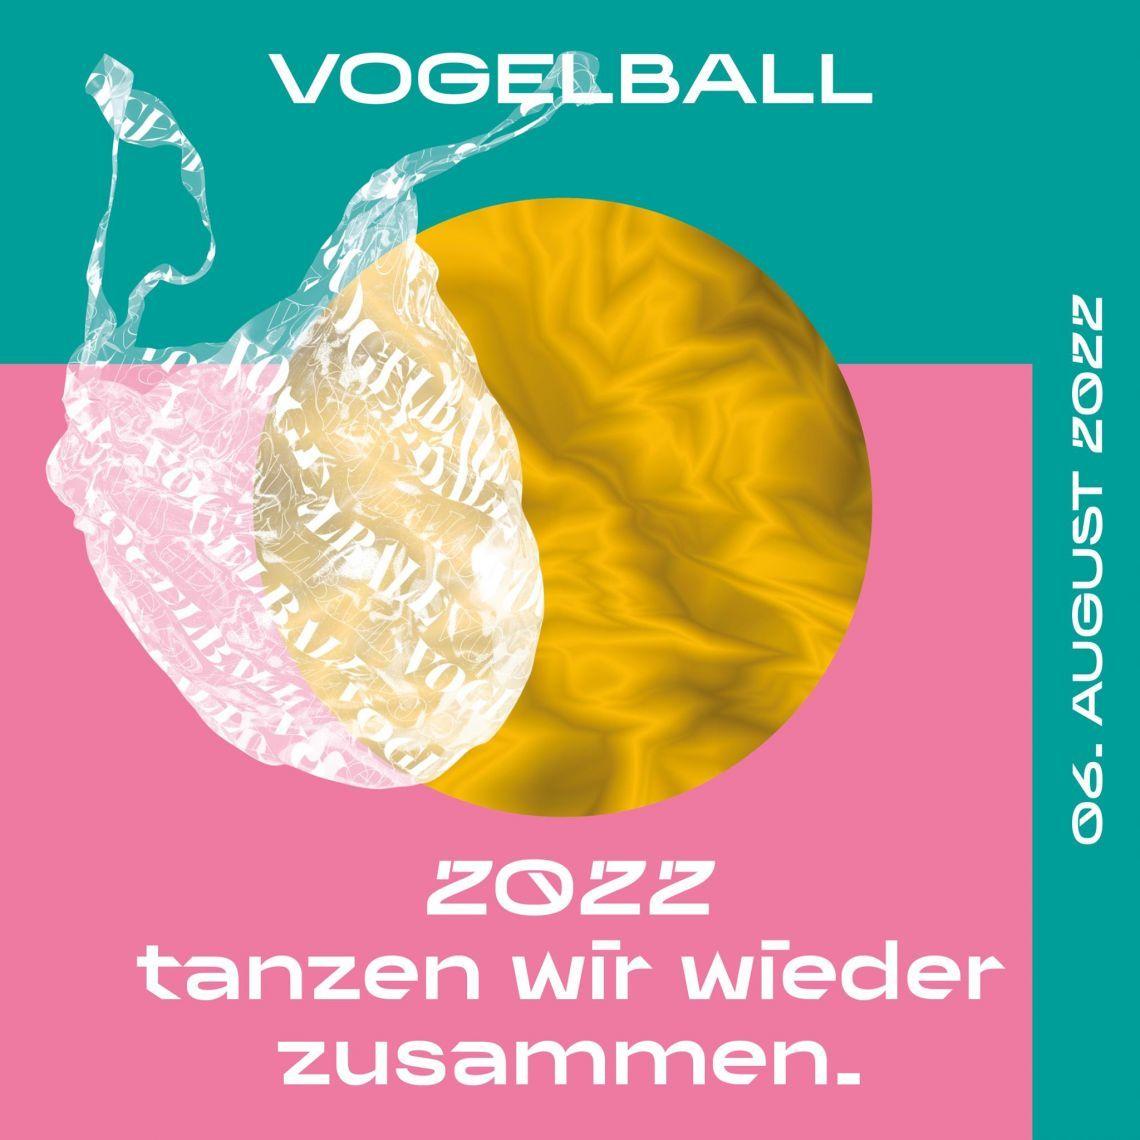 Vogelball 2022